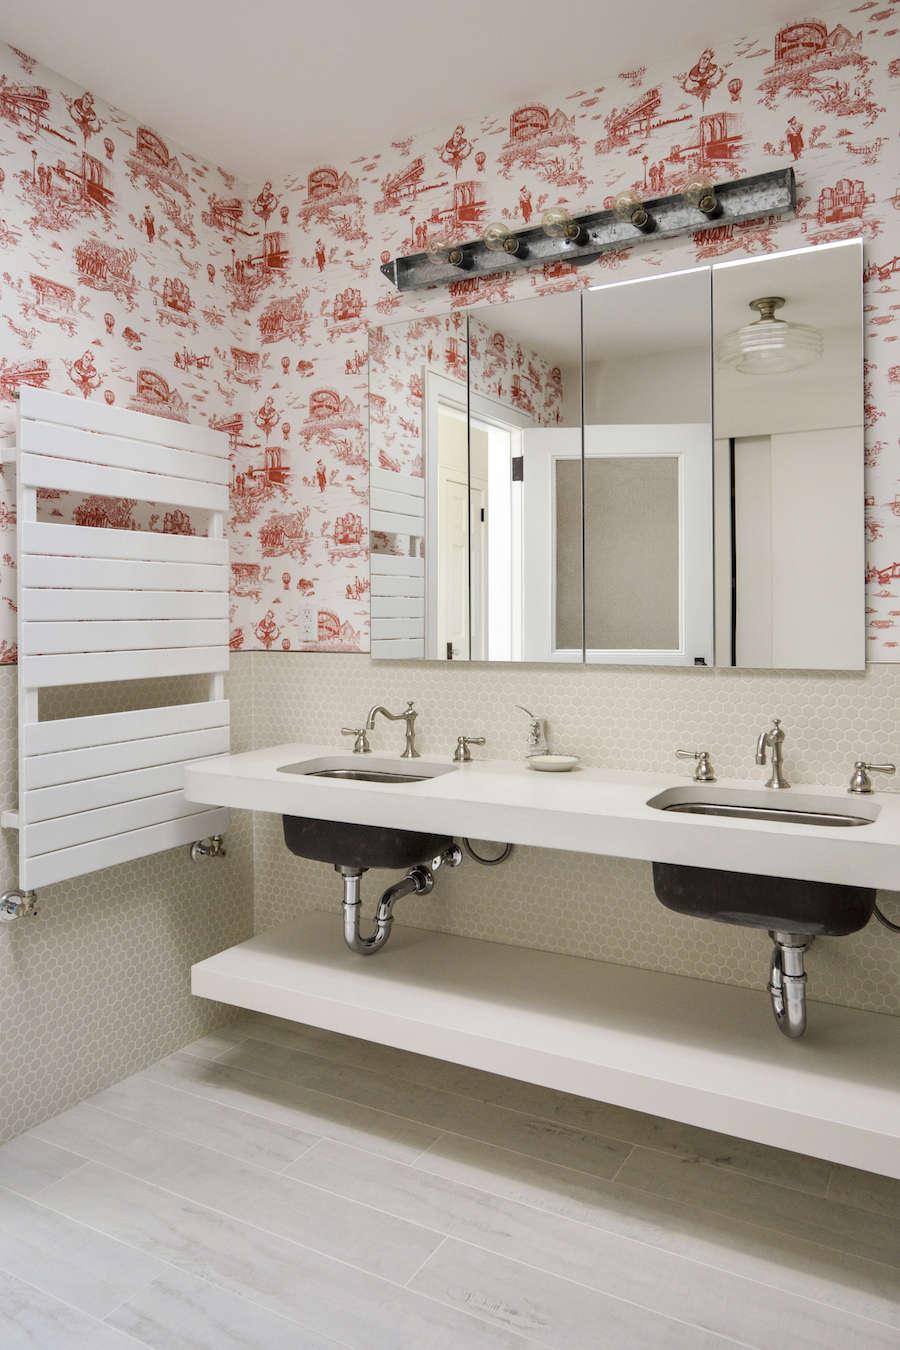 brooklyn toile in architects gregory merkel and catalina roja's brooklyn bathro 23